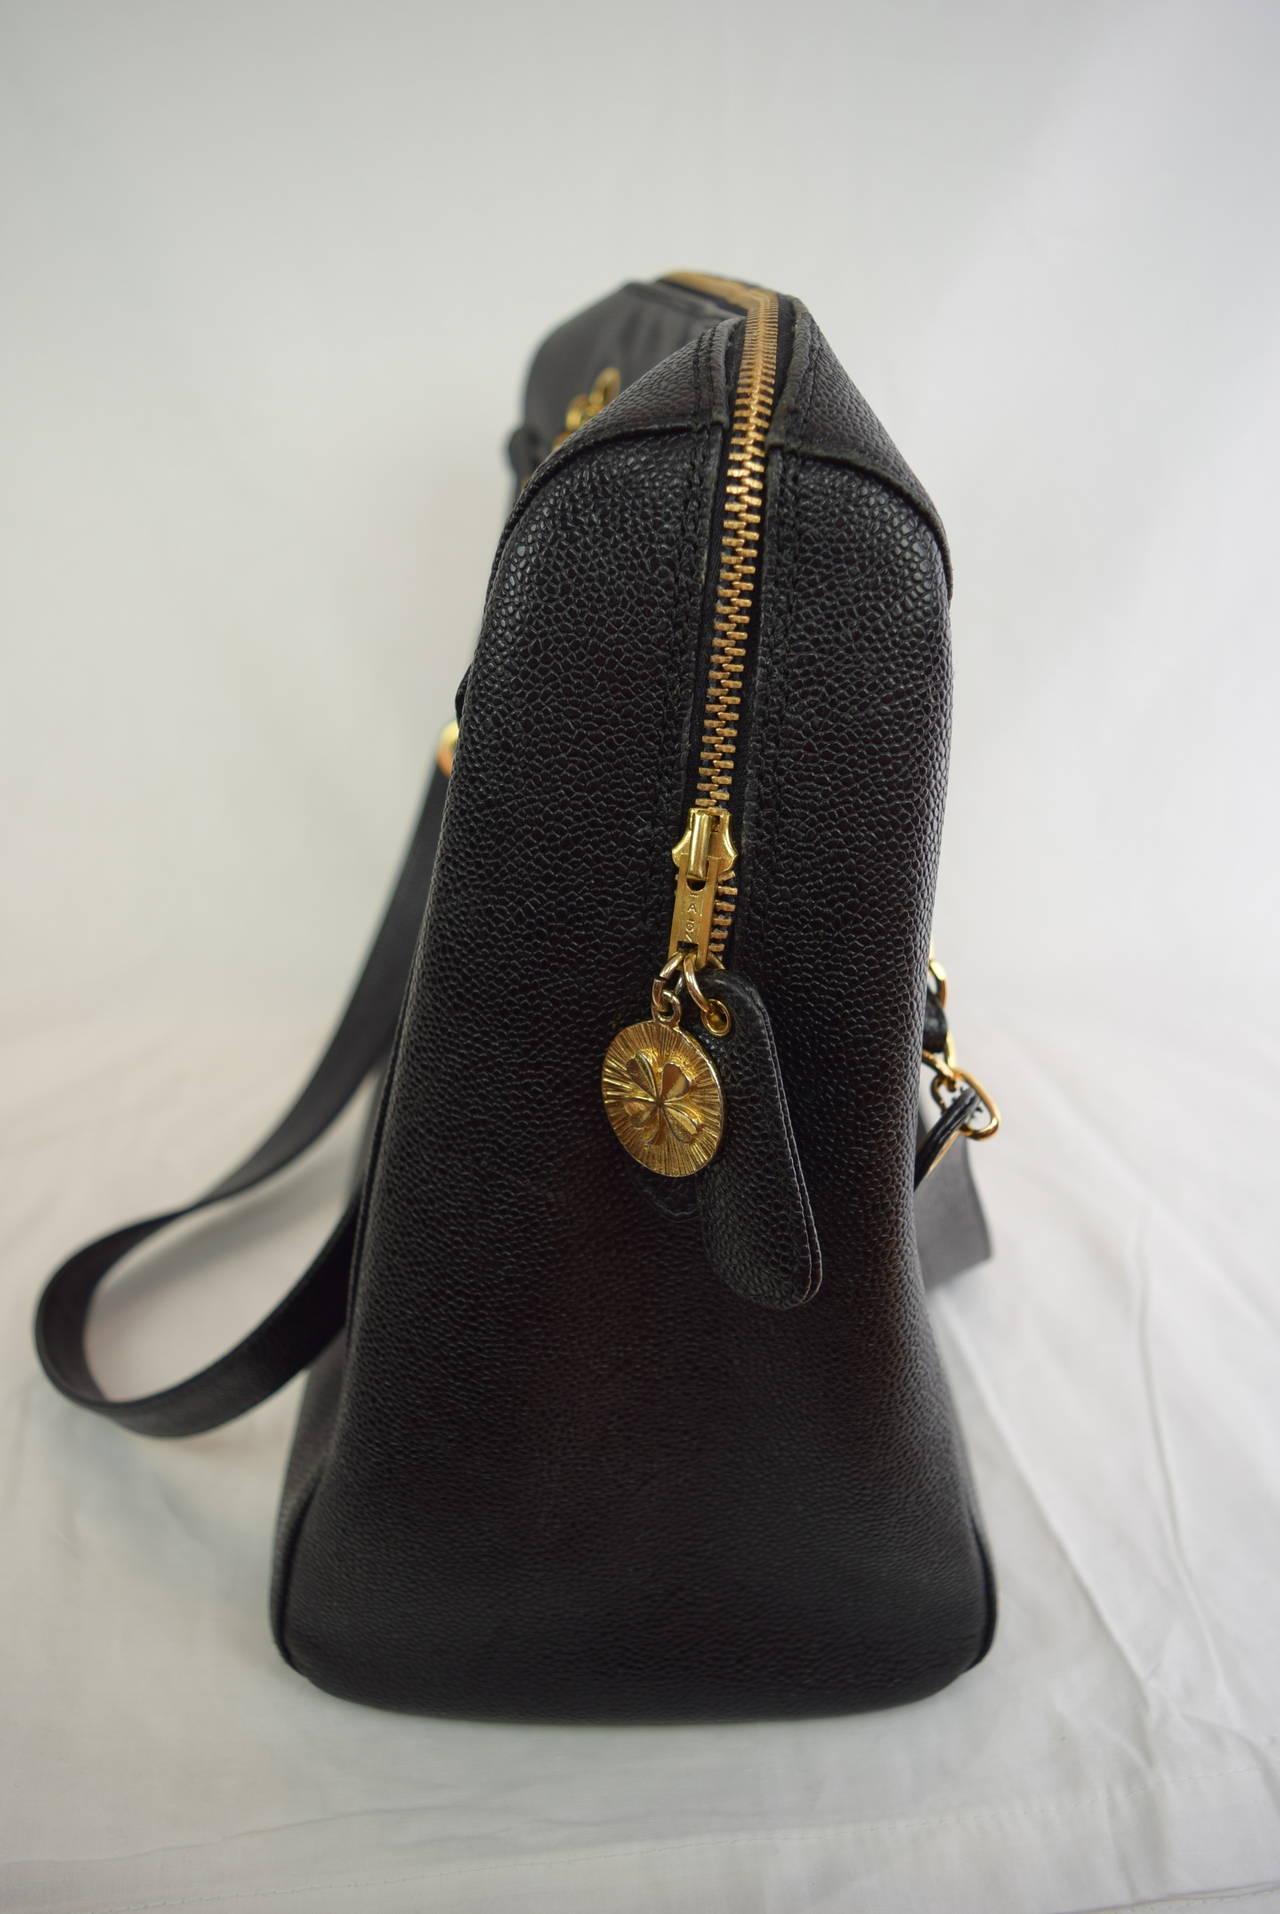 Chanel Boston Bag Black Caviar Shoulder Bag :Circa :1999 4